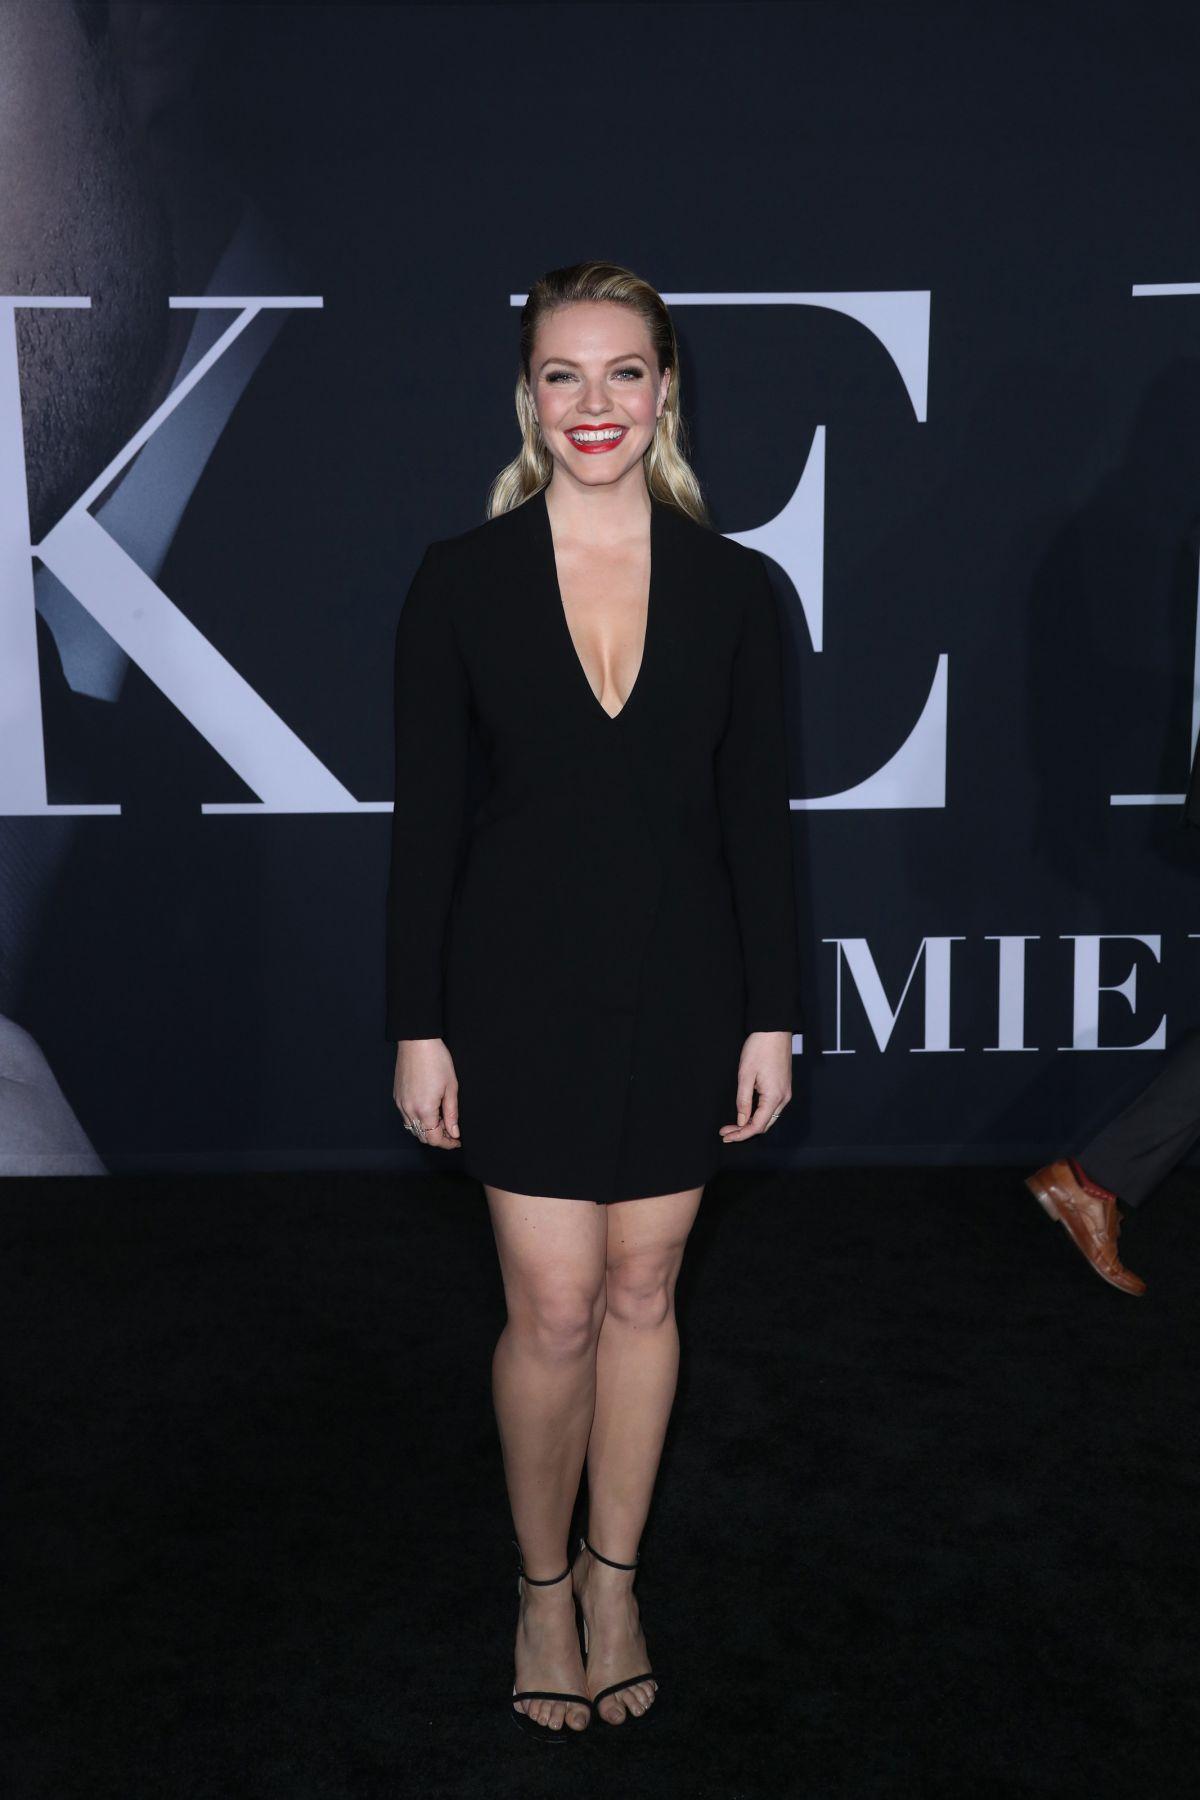 ELOISE MUMFORD at 'Fifty Shades Darker' Premiere in Los Angeles 02/02/2017